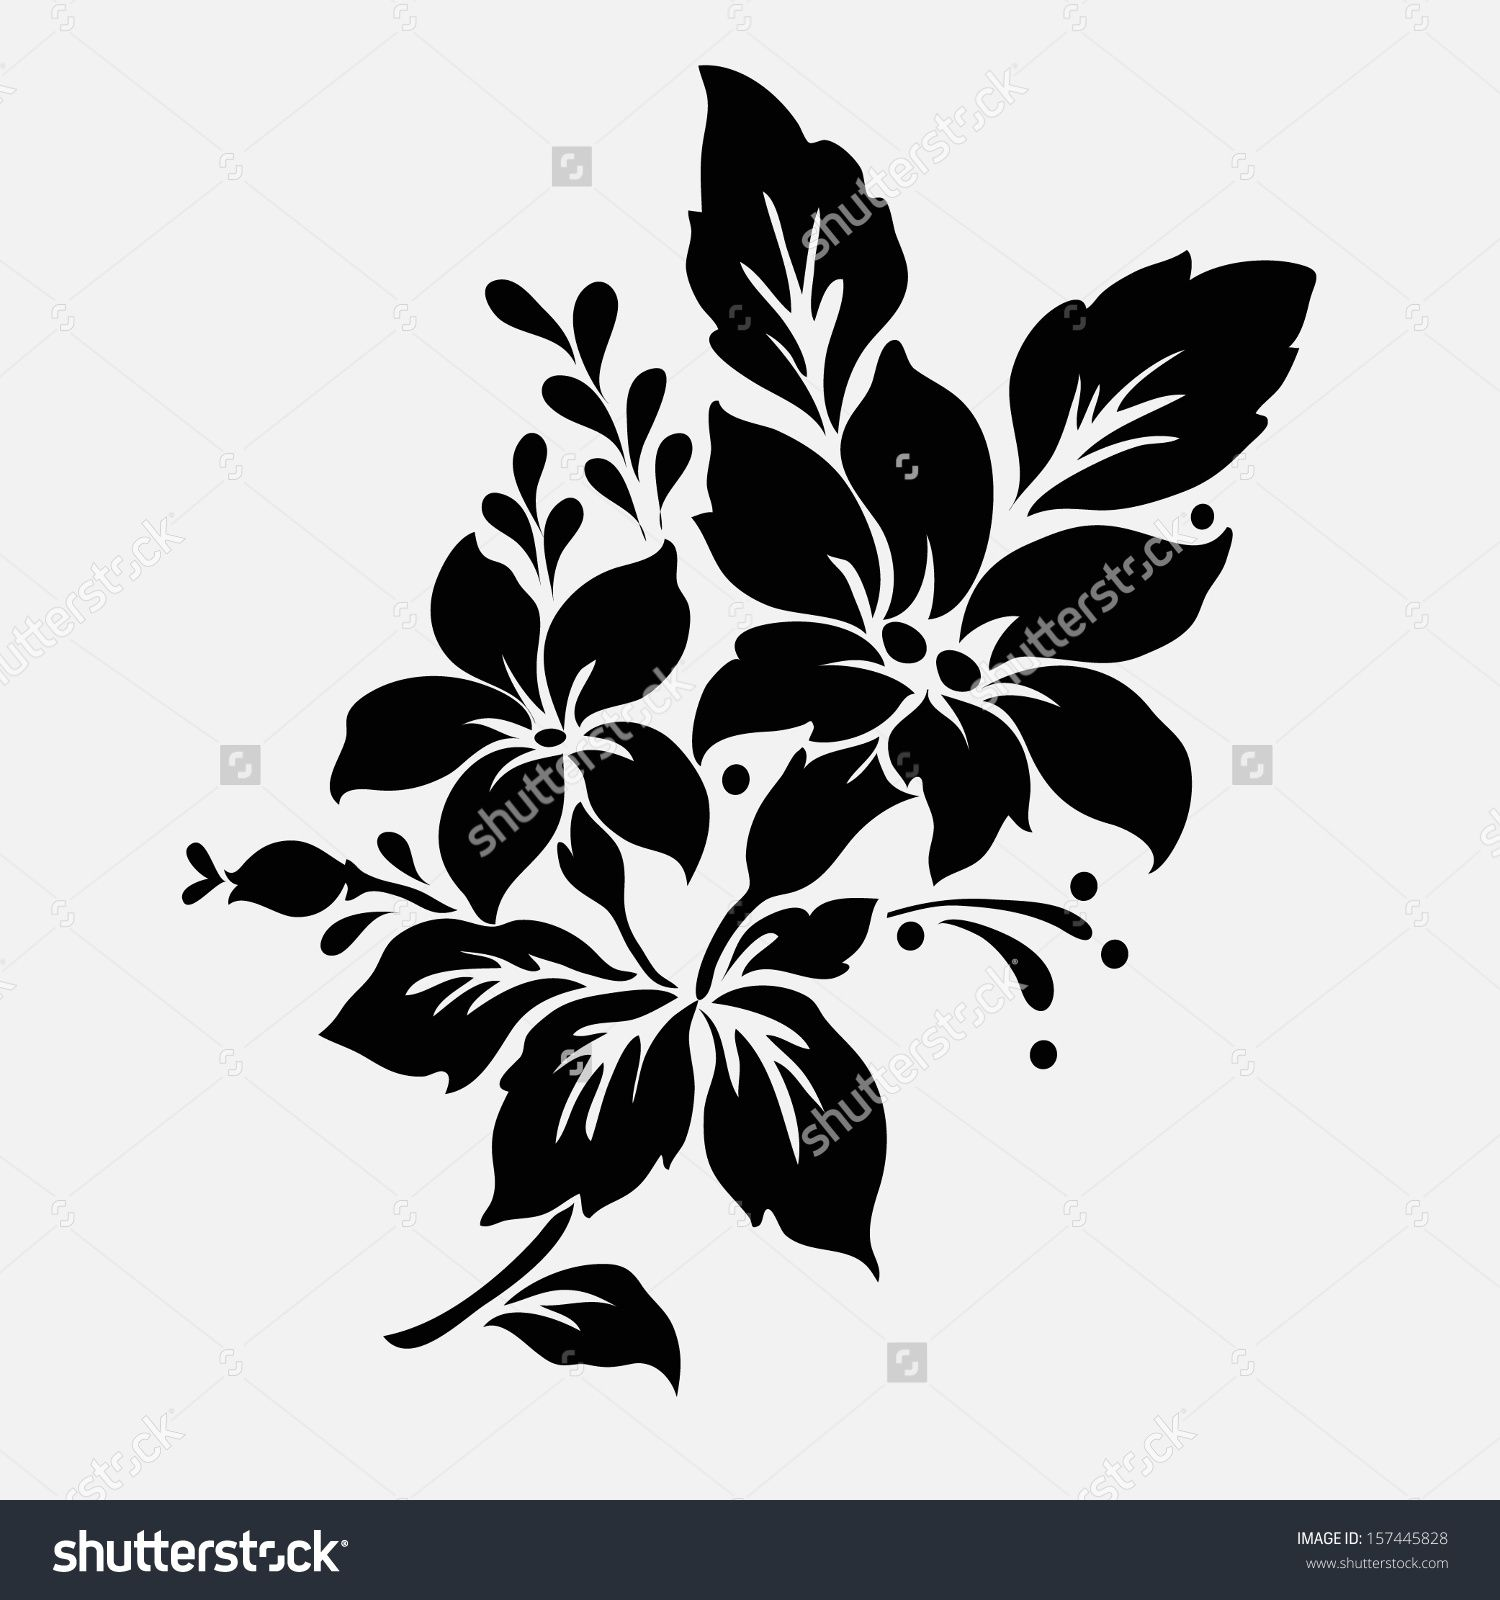 Image result for flower vector | flower | Pinterest | Flowers and ...